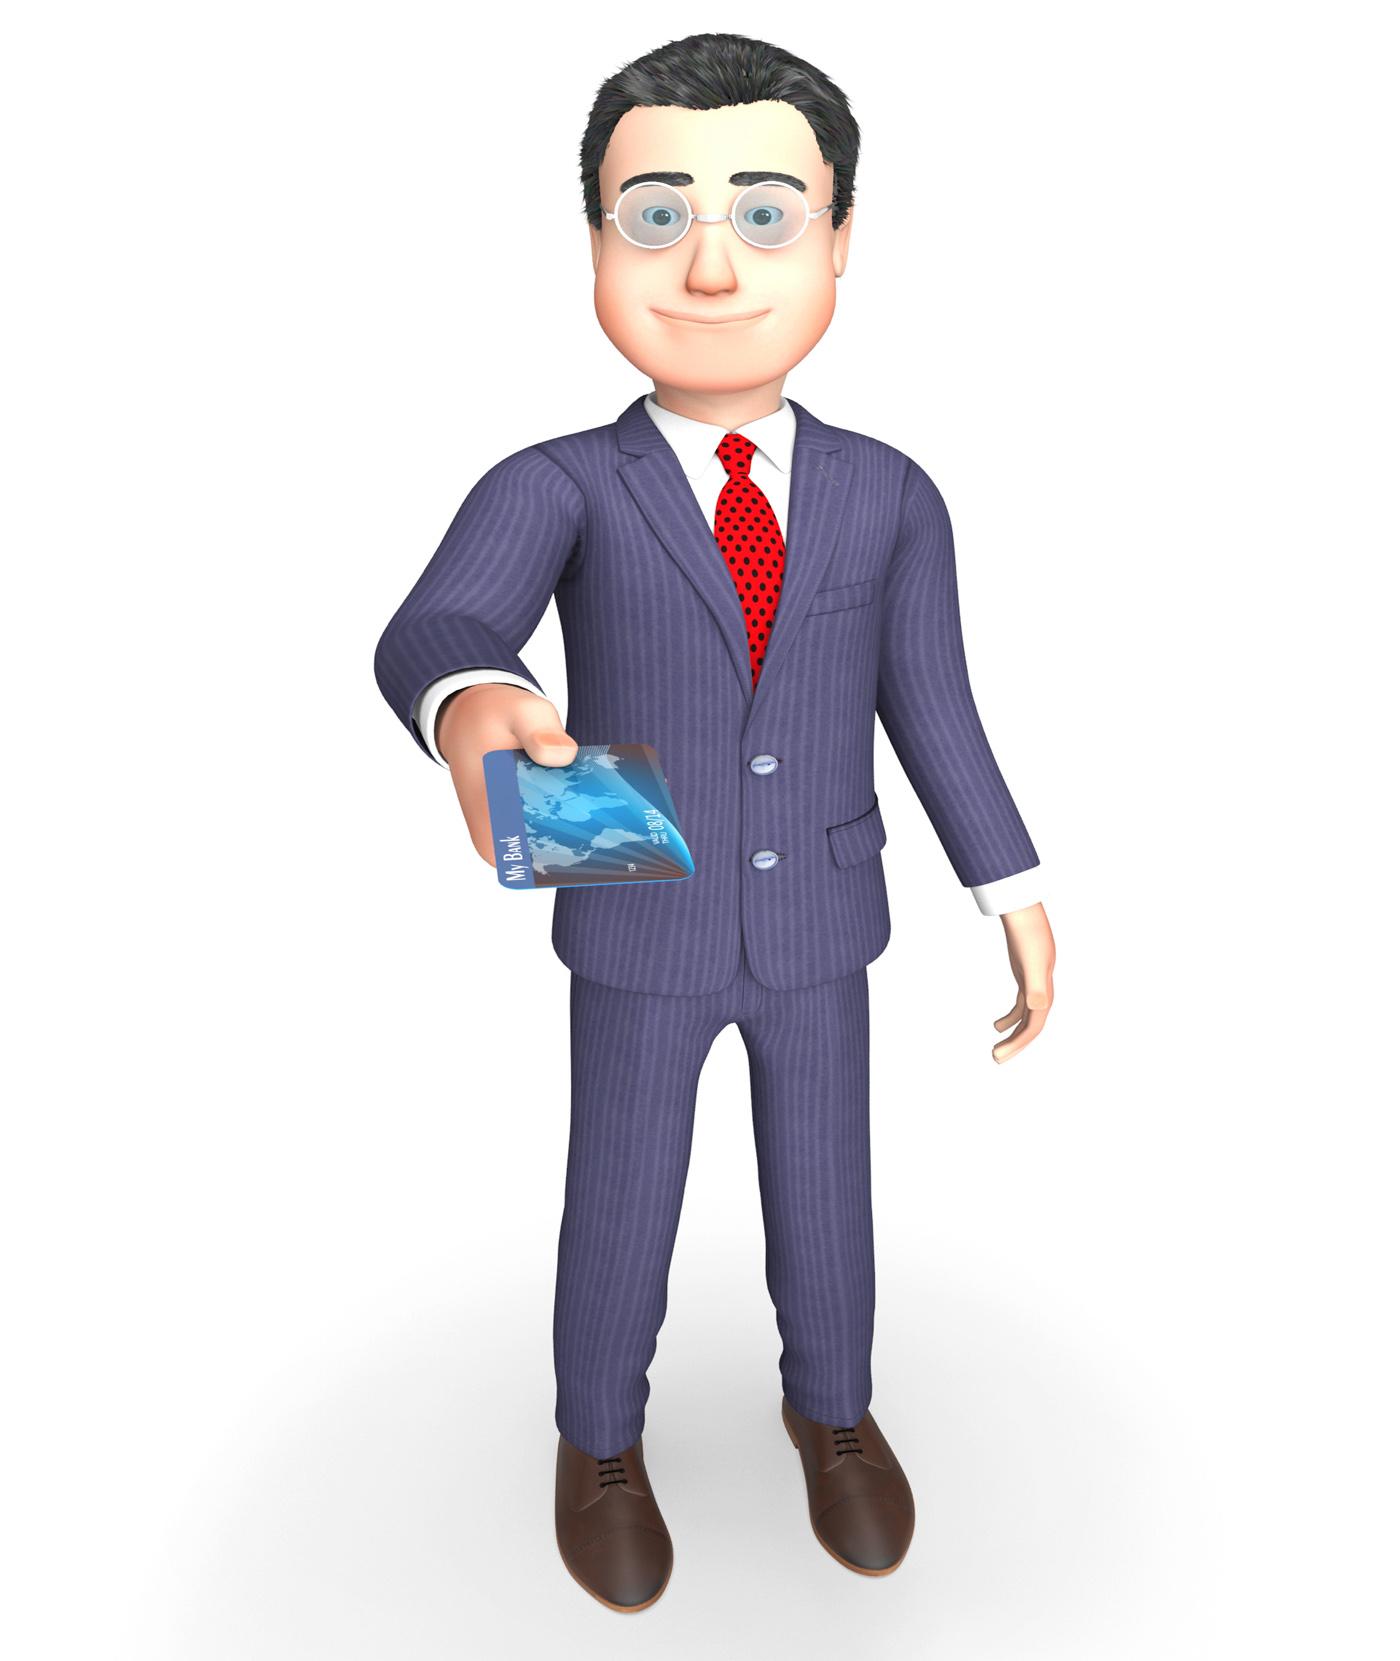 Debit Card Represents Business Person And Banking 3d Rendering, 3drendering, OtherKeywords, Entrepreneur, Entrepreneurial, HQ Photo